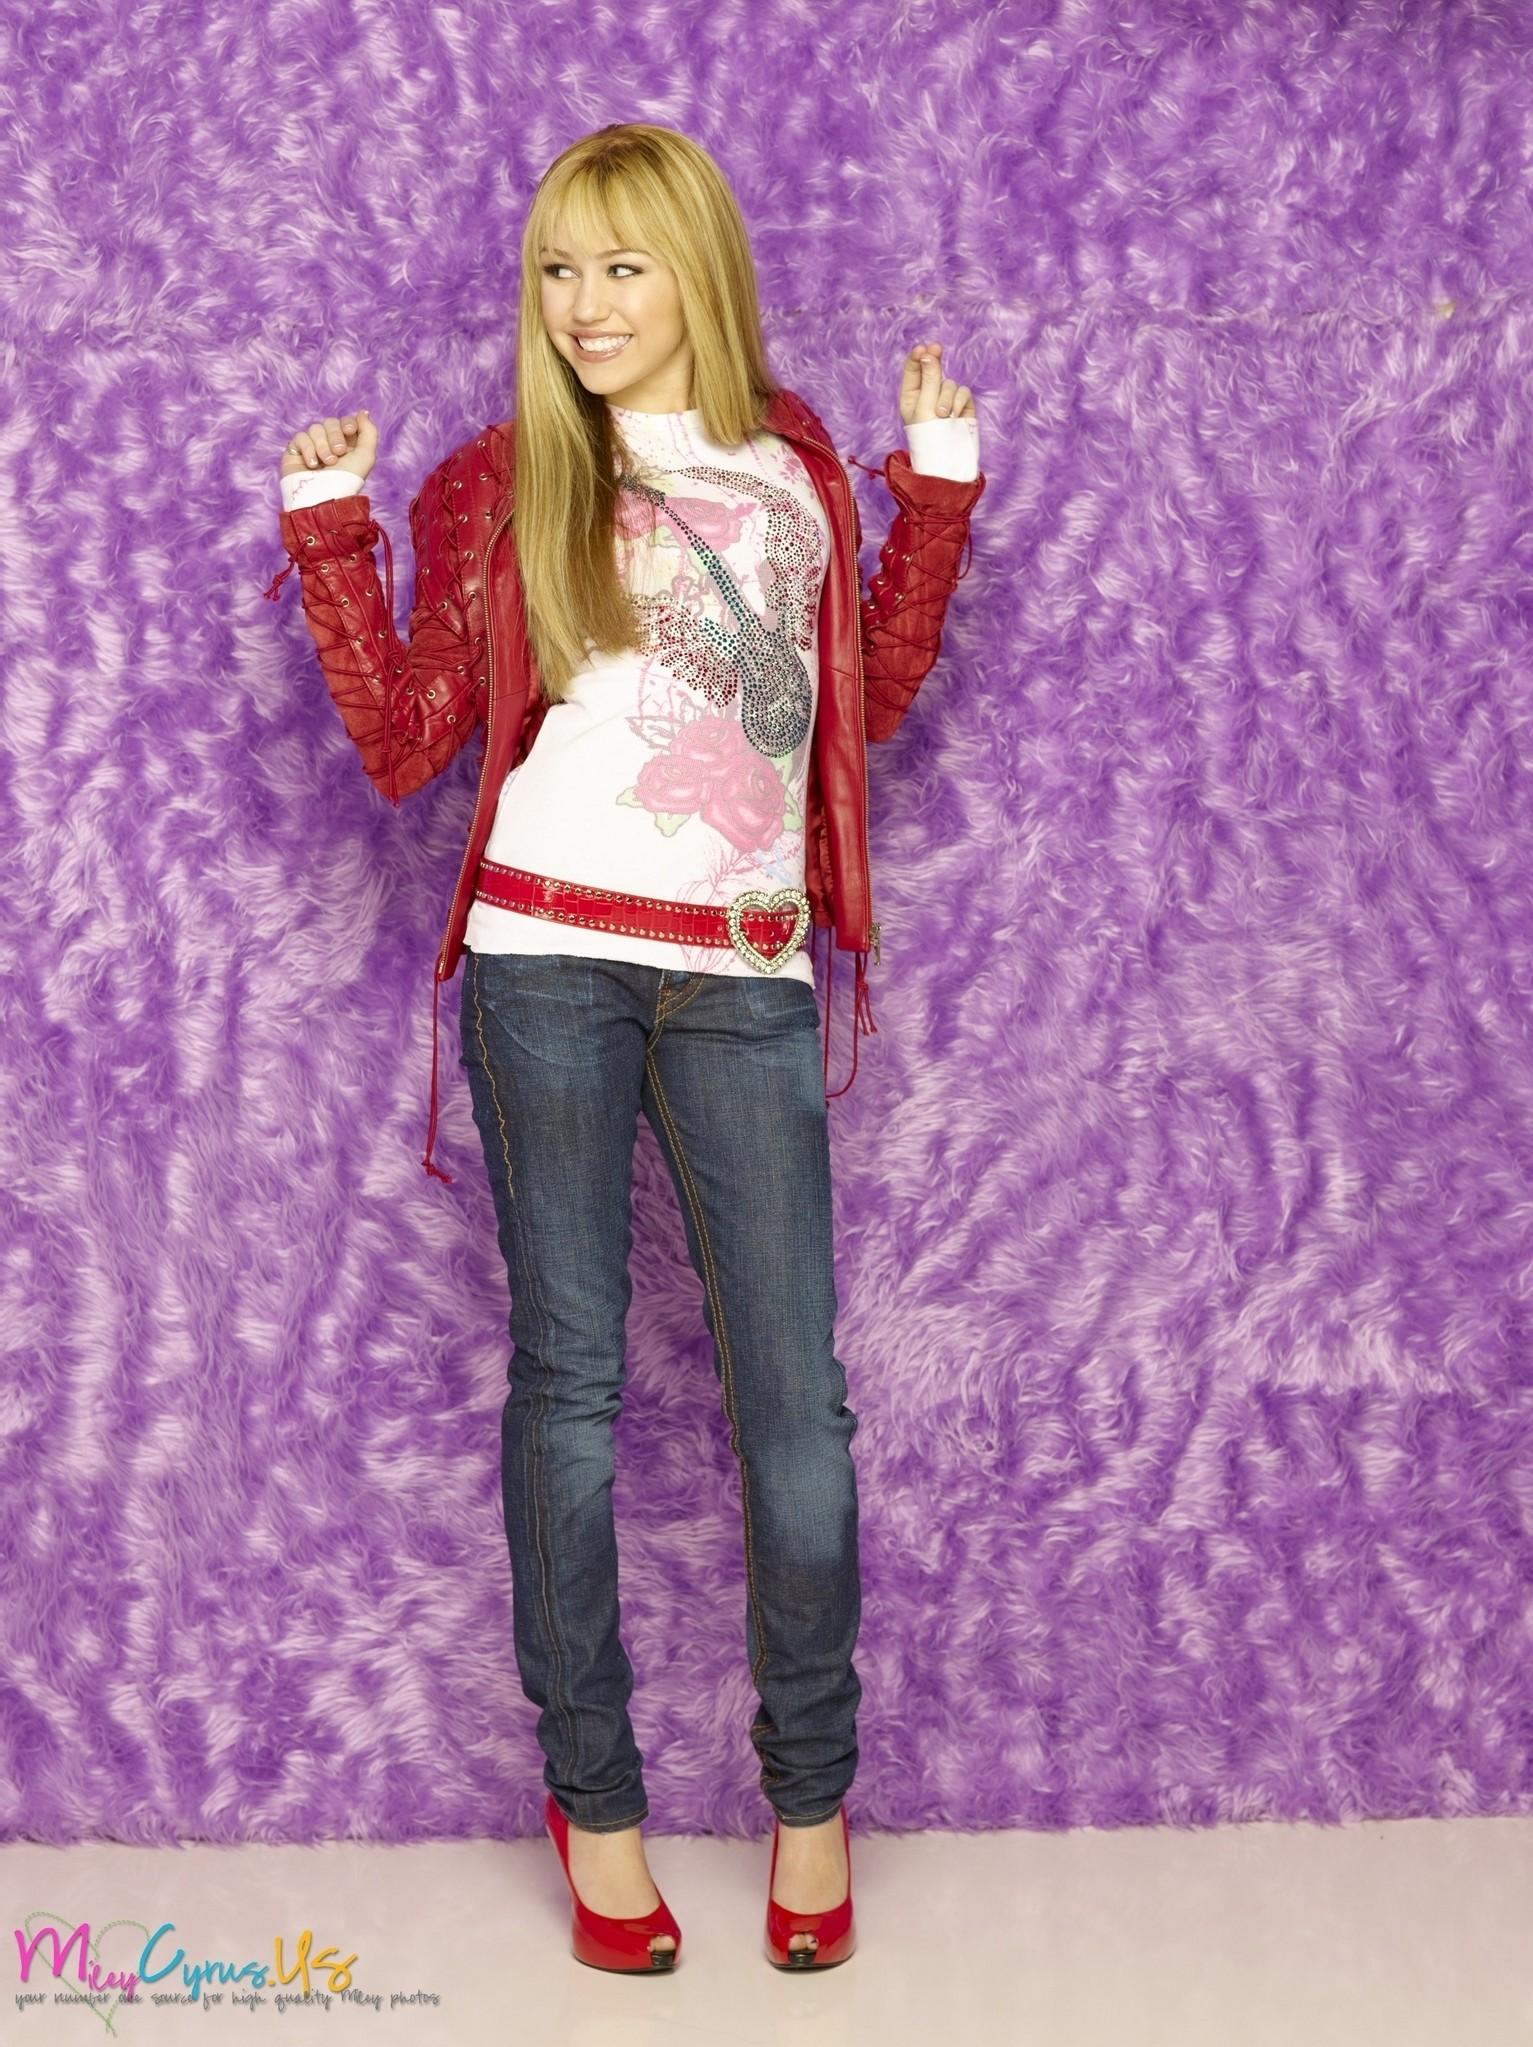 Hannah Montana Wallpapers ·①